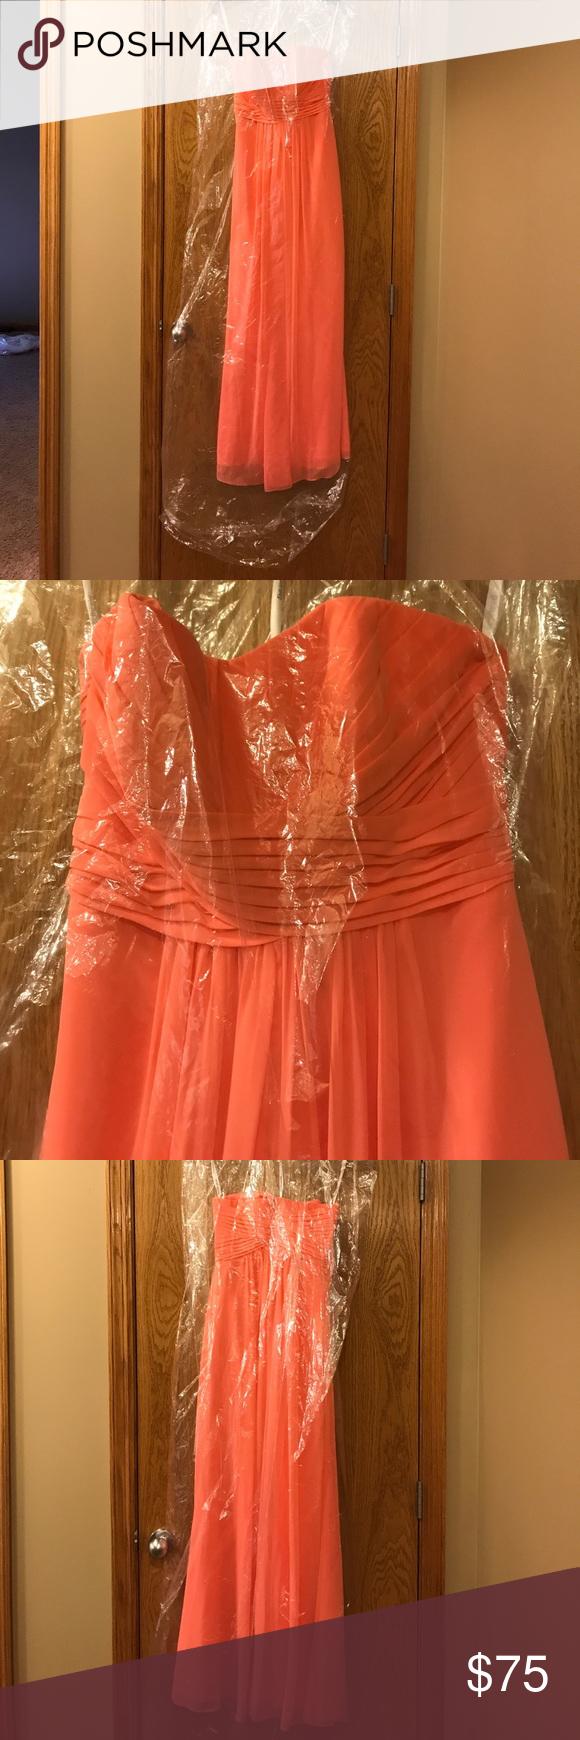 Saledavids bridal bridesmaid or prom dress davids bridal